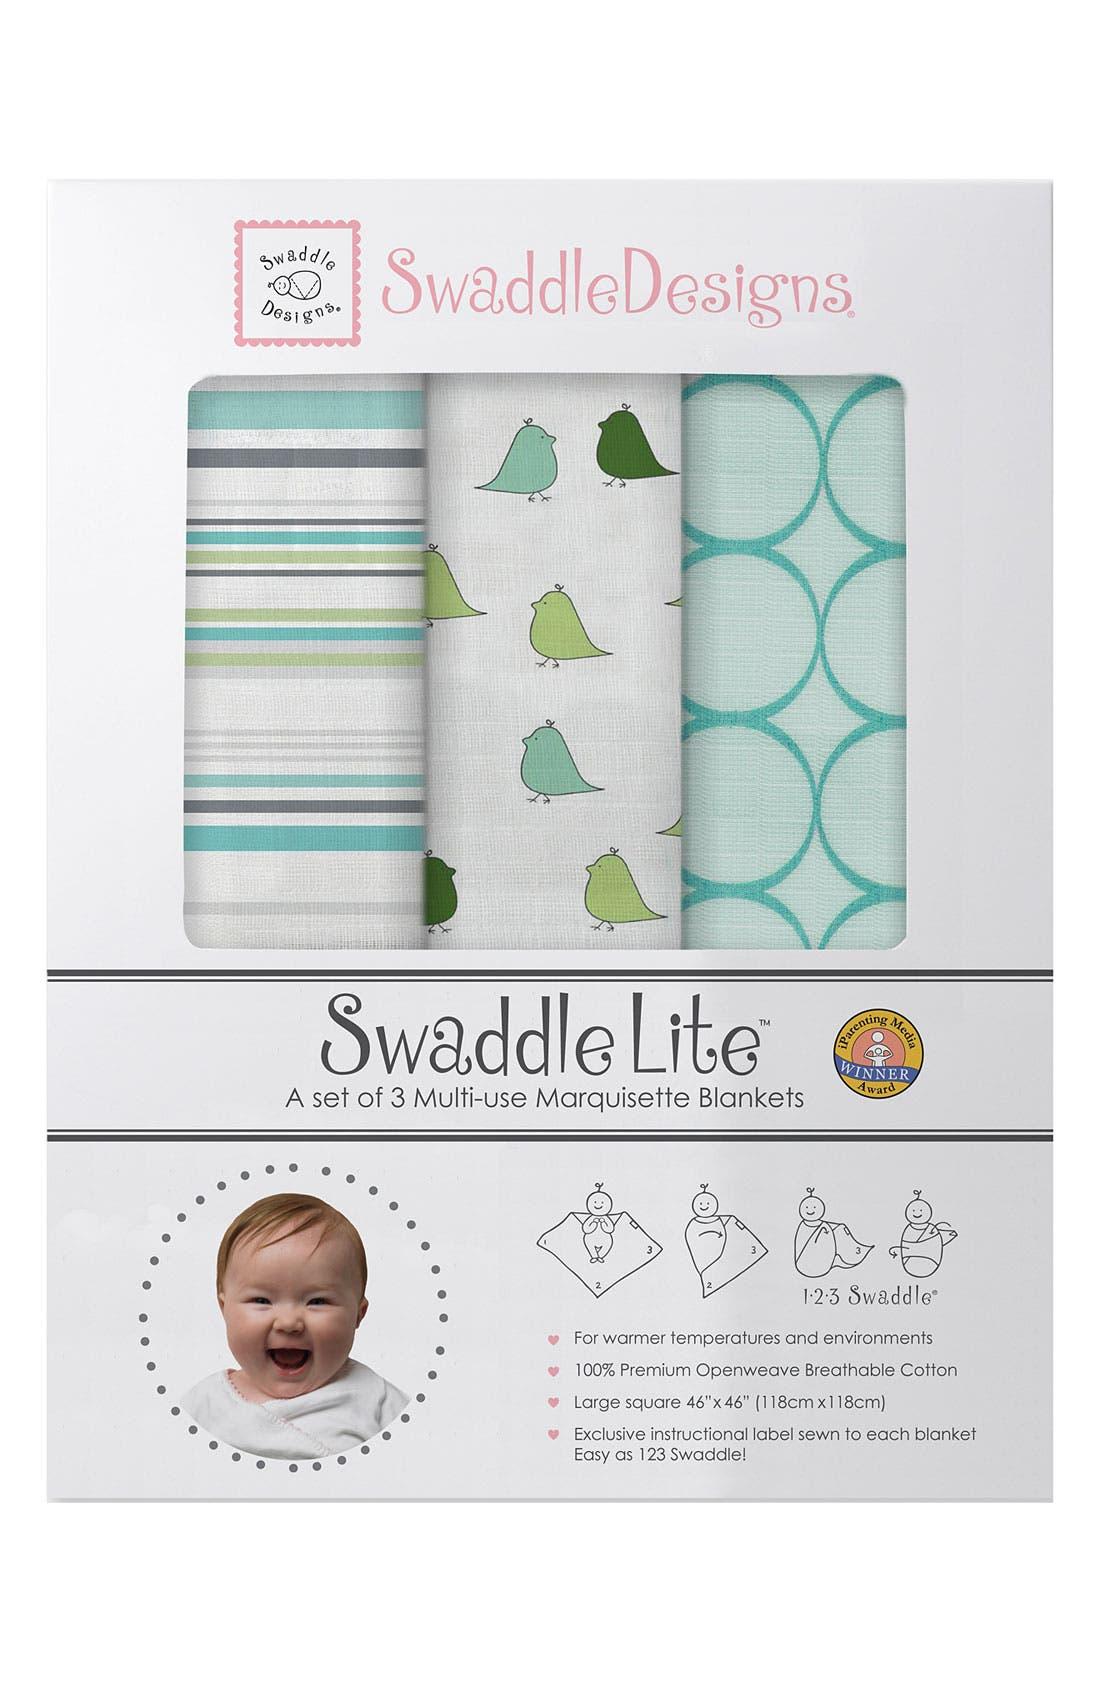 Main Image - Swaddle Designs 'Swaddle Lite' Marquisette Blanket (Set of 3)